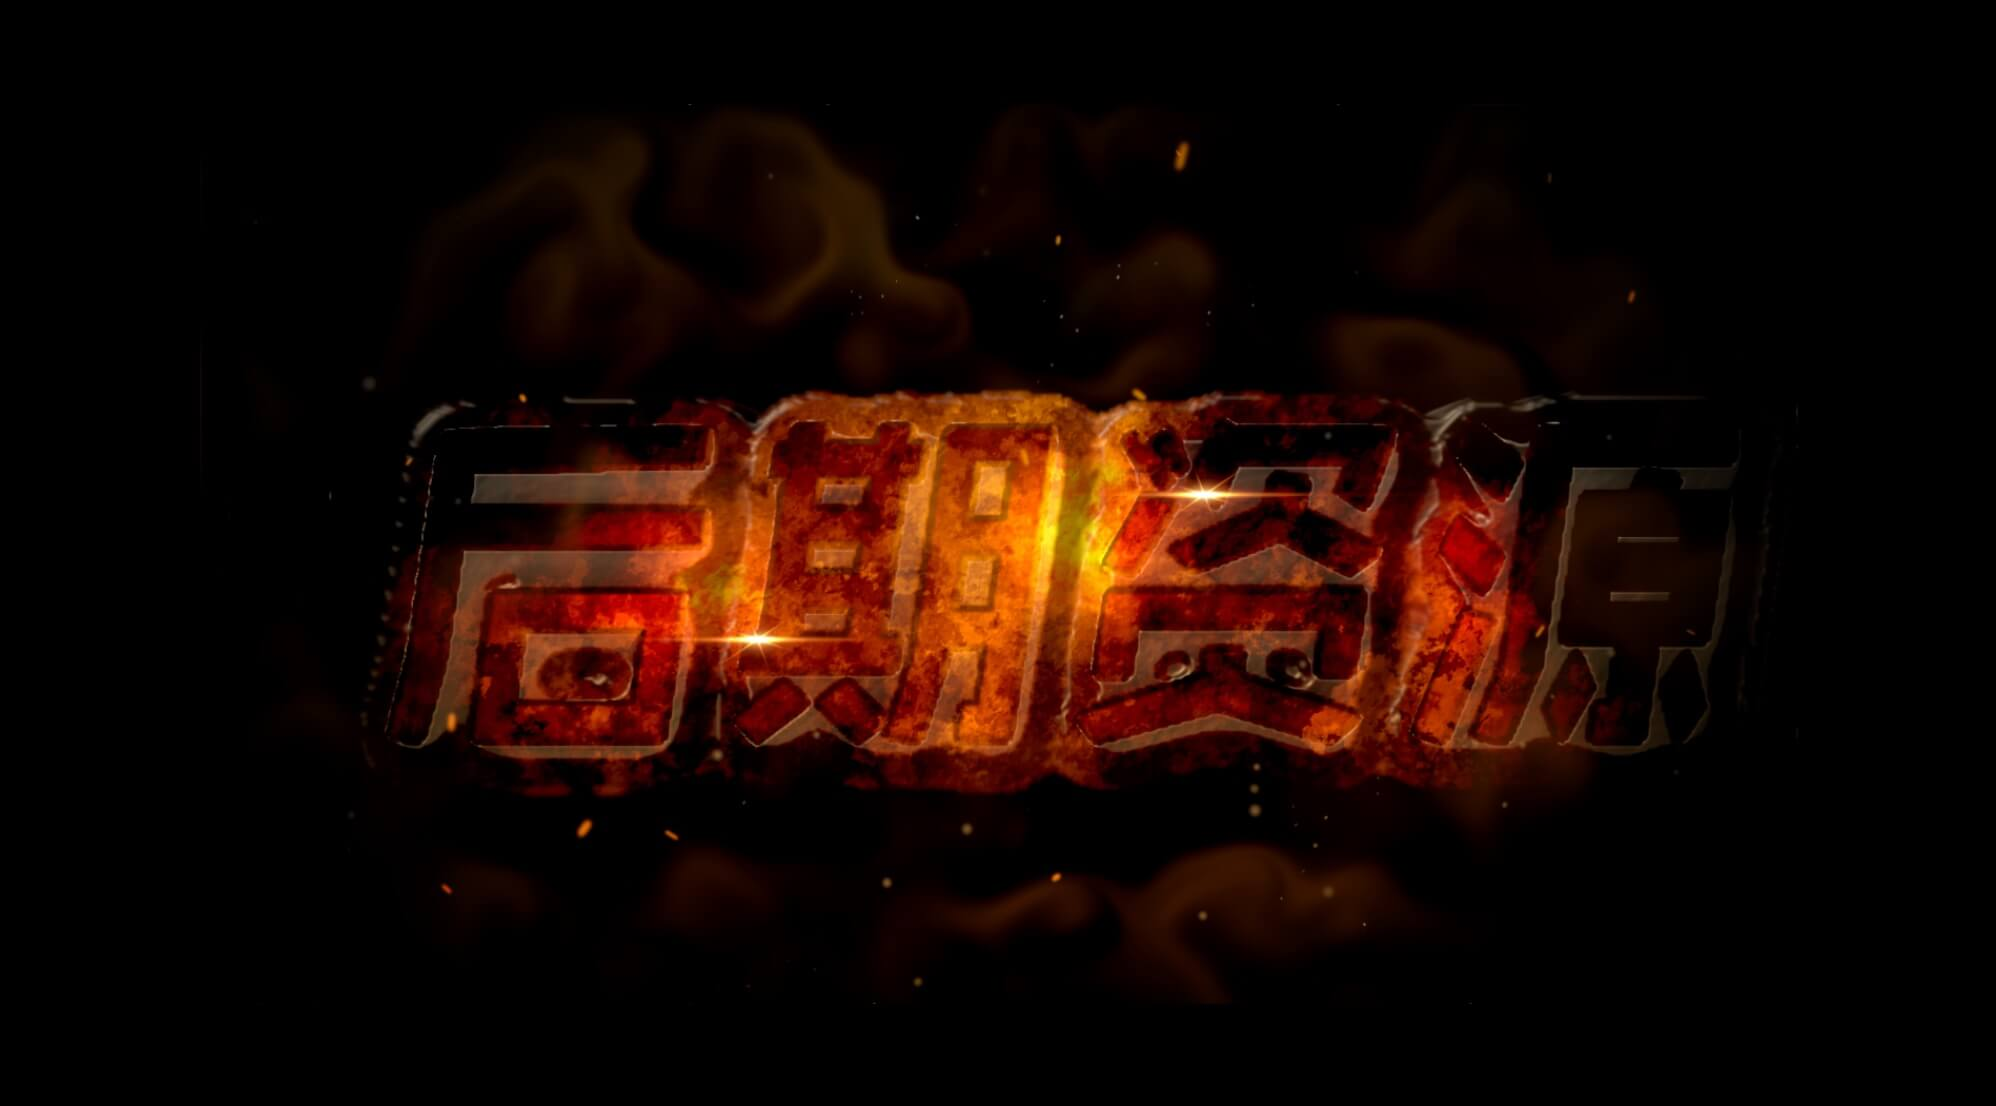 fcpx插件 震撼电影预告片大标题图文展示片头模板 Cinematic Trailer